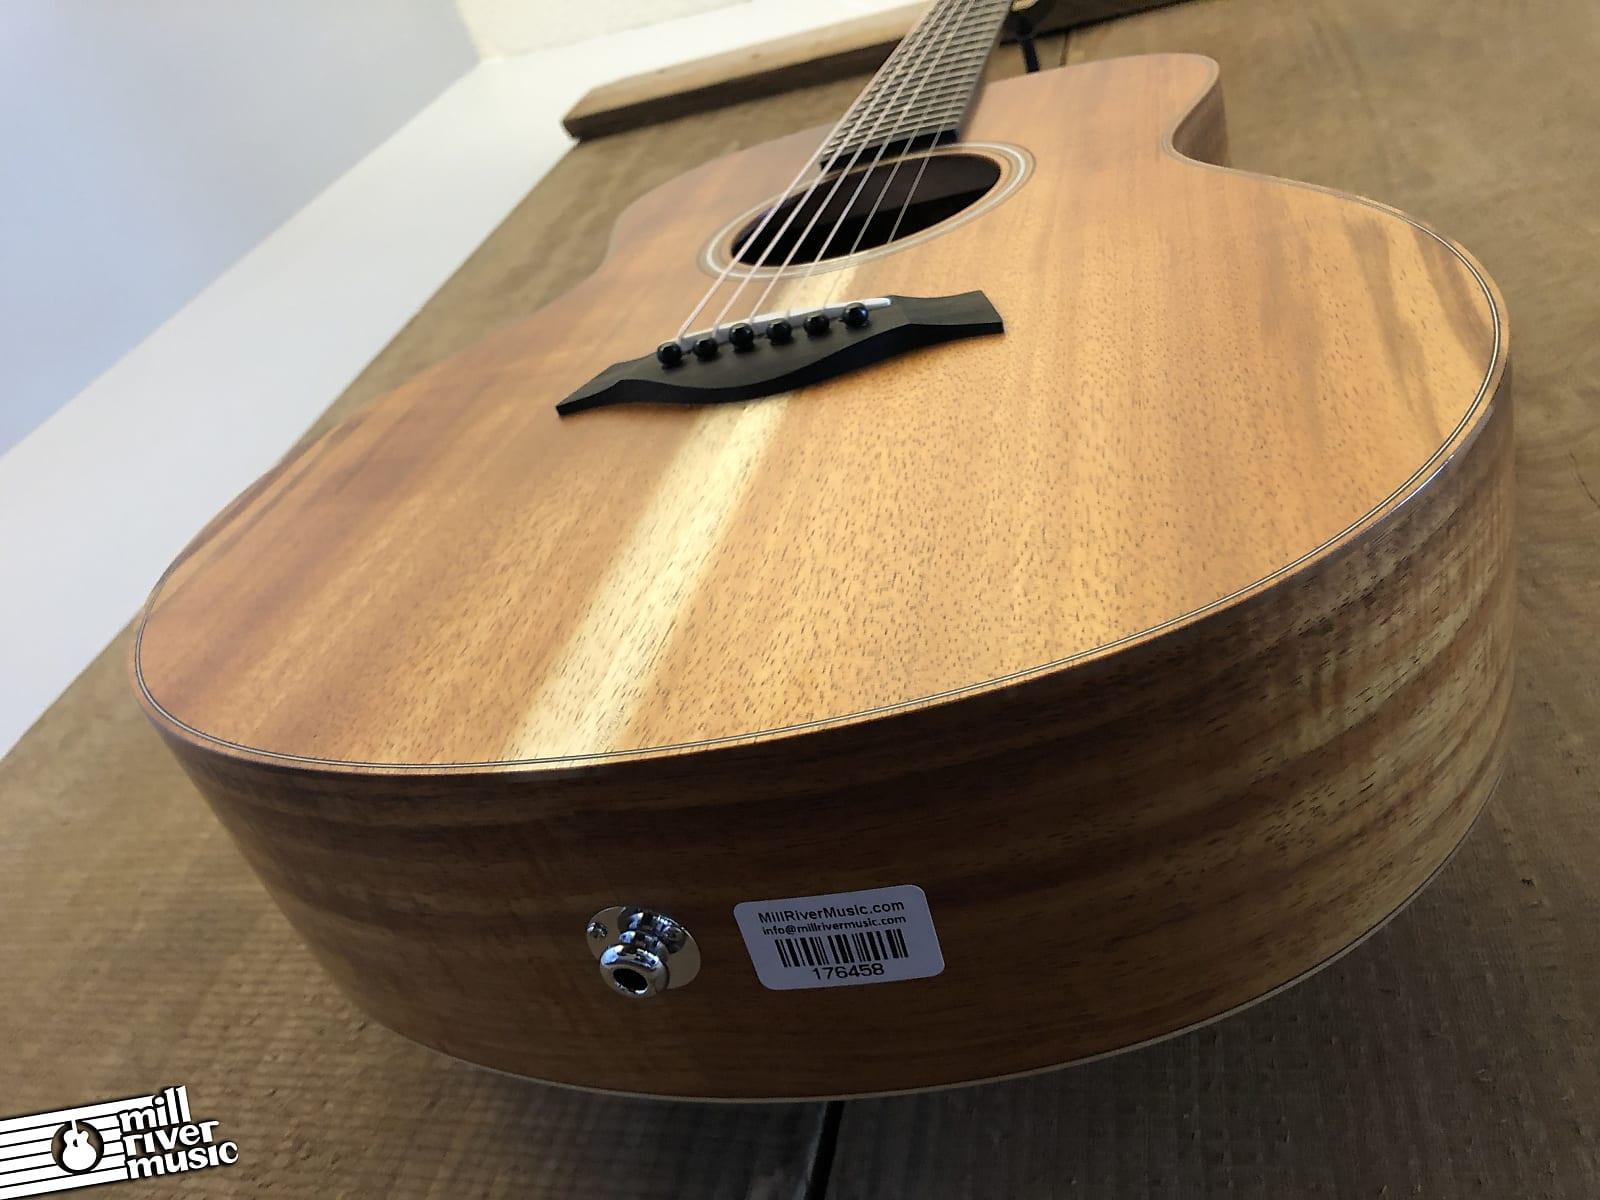 Taylor GS Mini-e Koa Acoustic Electric Guitar Natural 2018 w/ Gig Bag